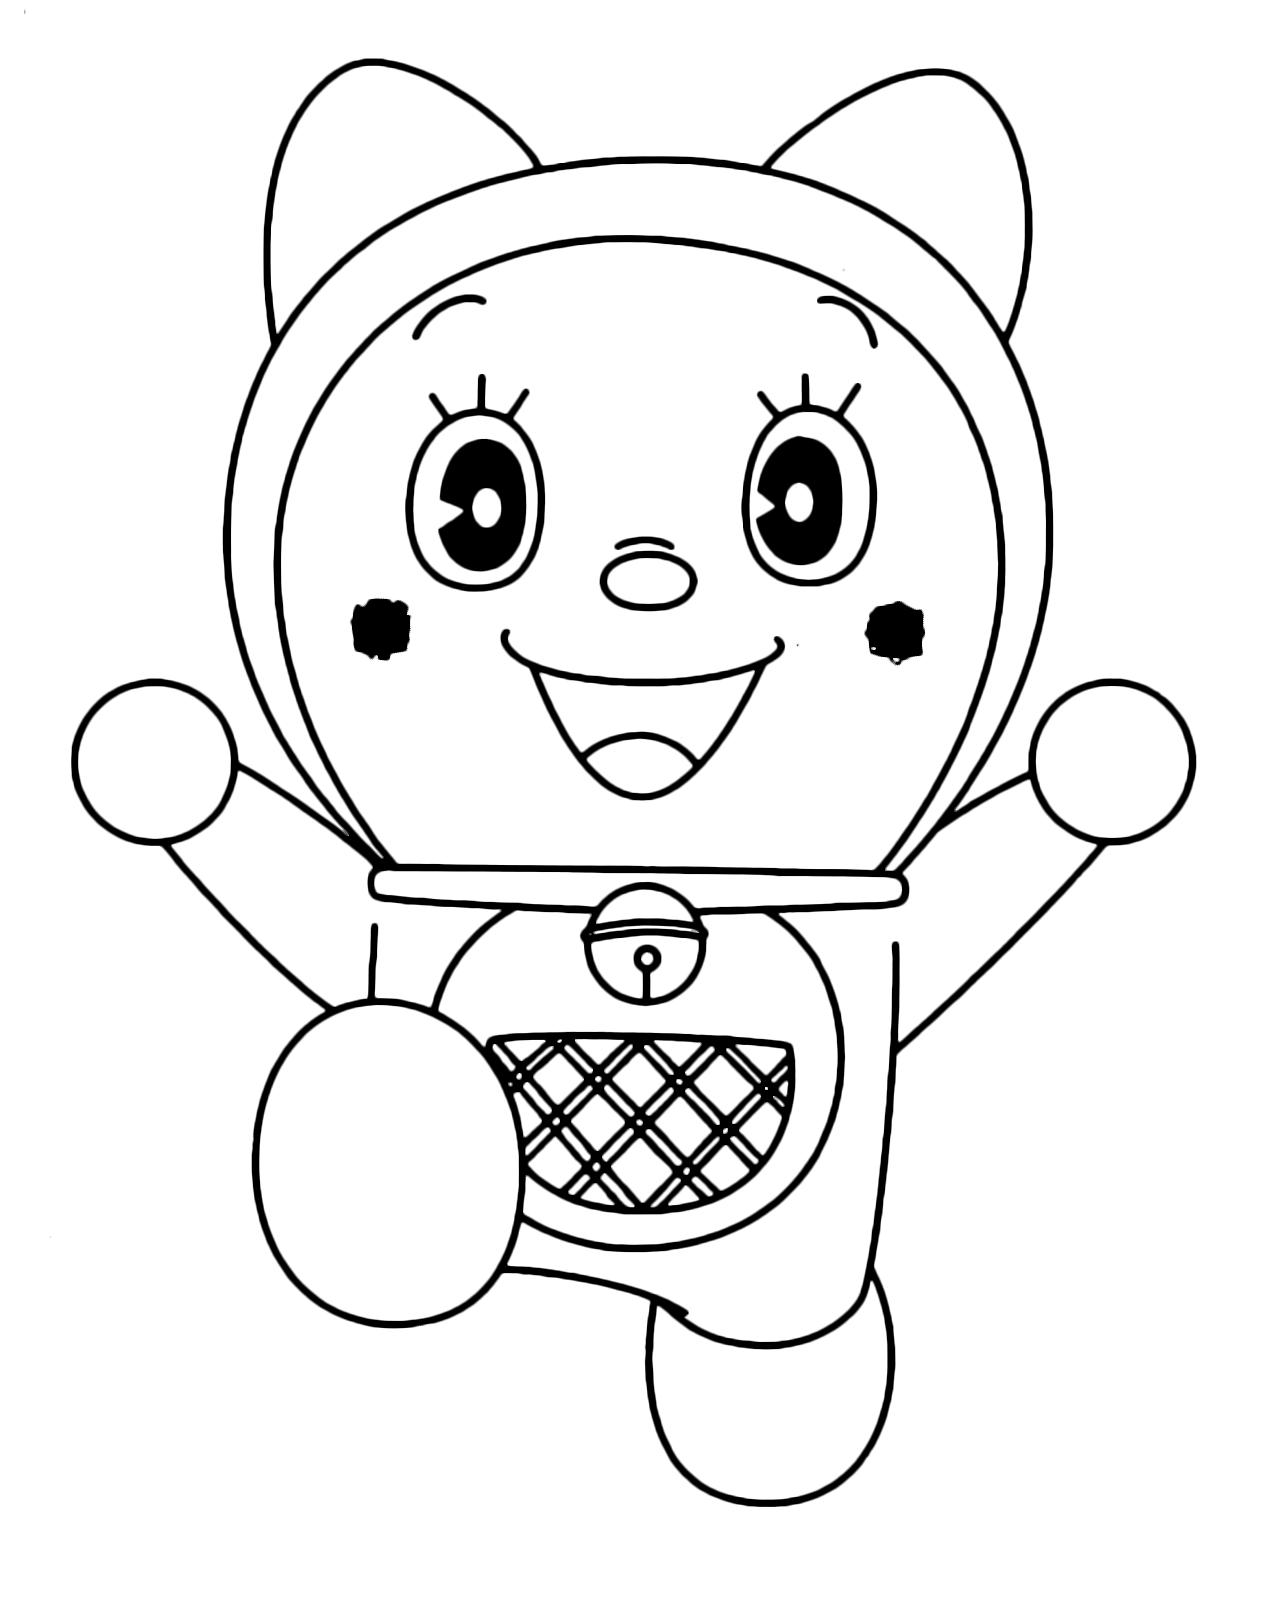 Image Gallery of Gambar Doraemon Lucu Unik